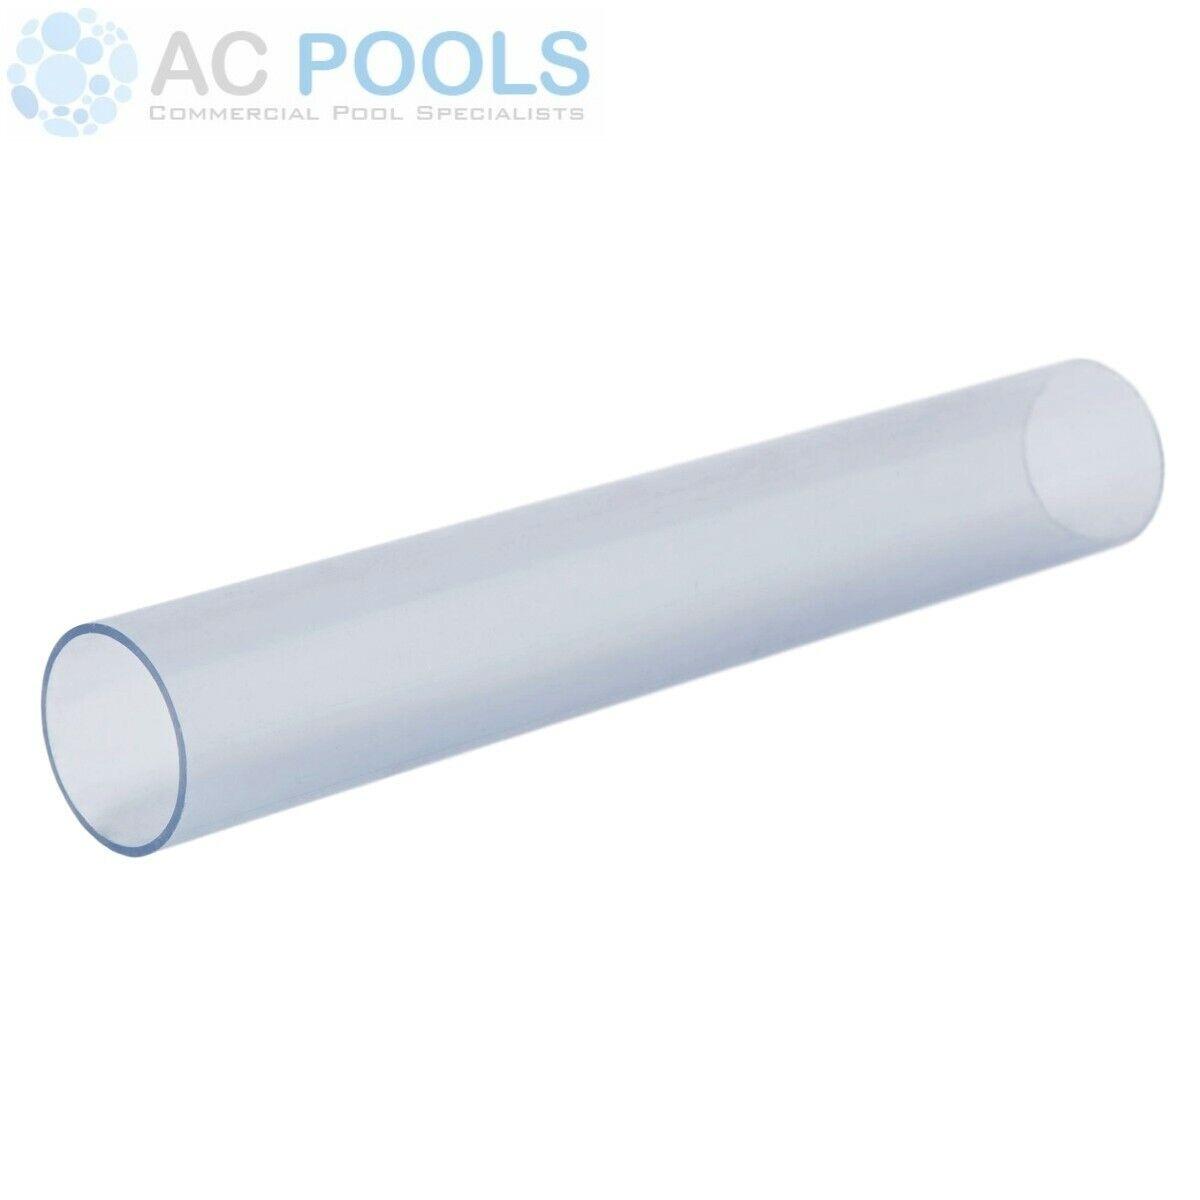 Clear PVC Pressure Pipe 200mm (500mm Length) Rigid